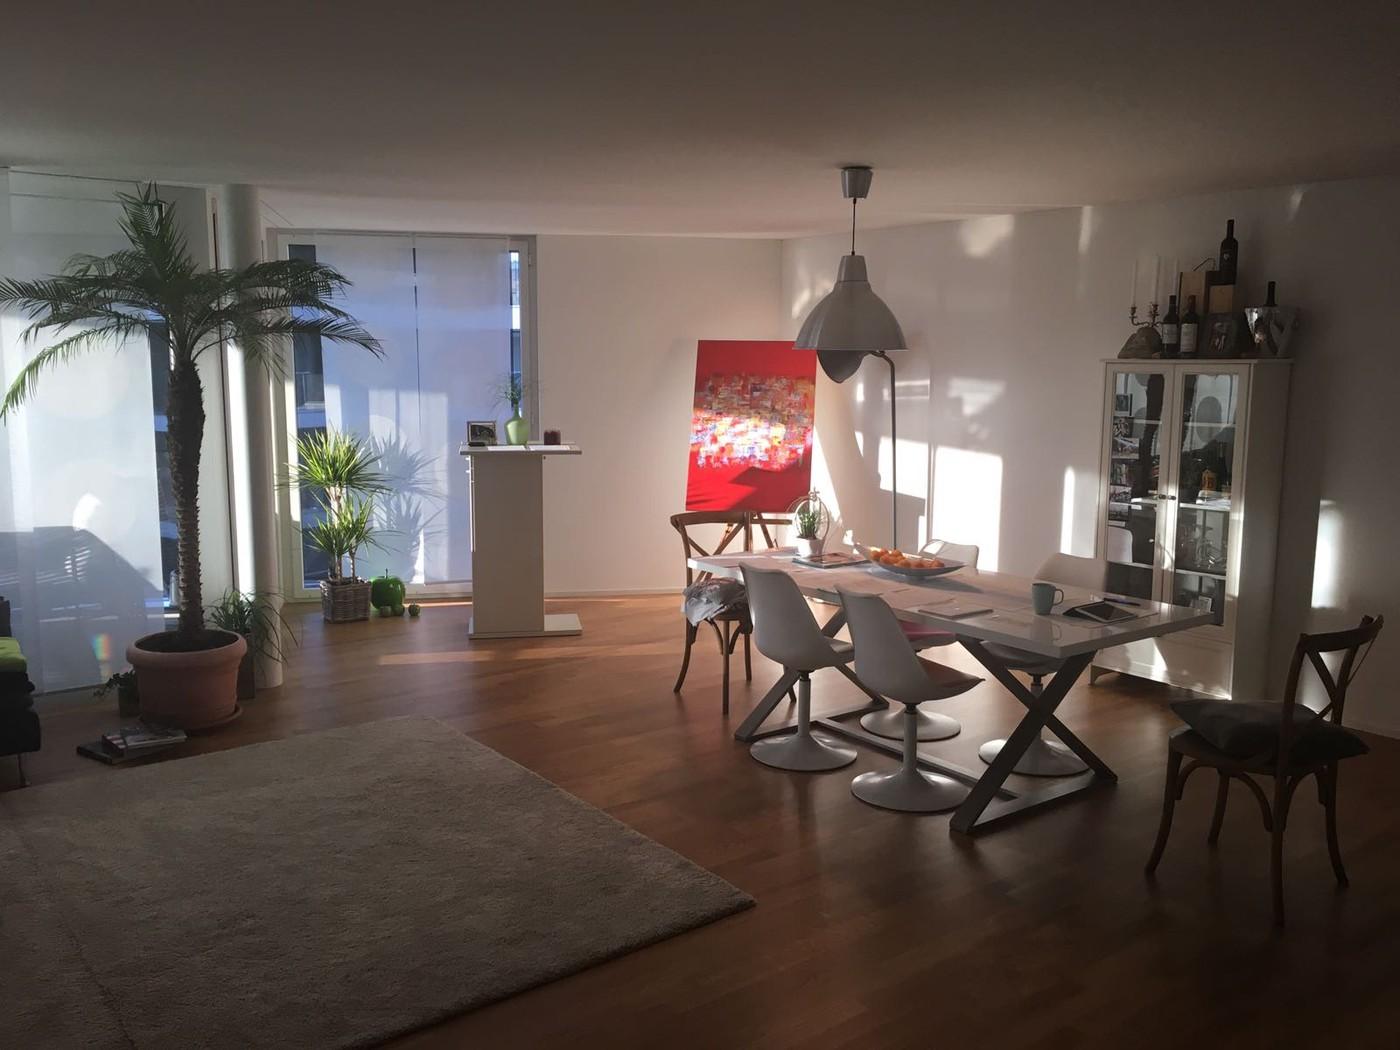 3 zimmer wohnung in zug mieten flatfox. Black Bedroom Furniture Sets. Home Design Ideas